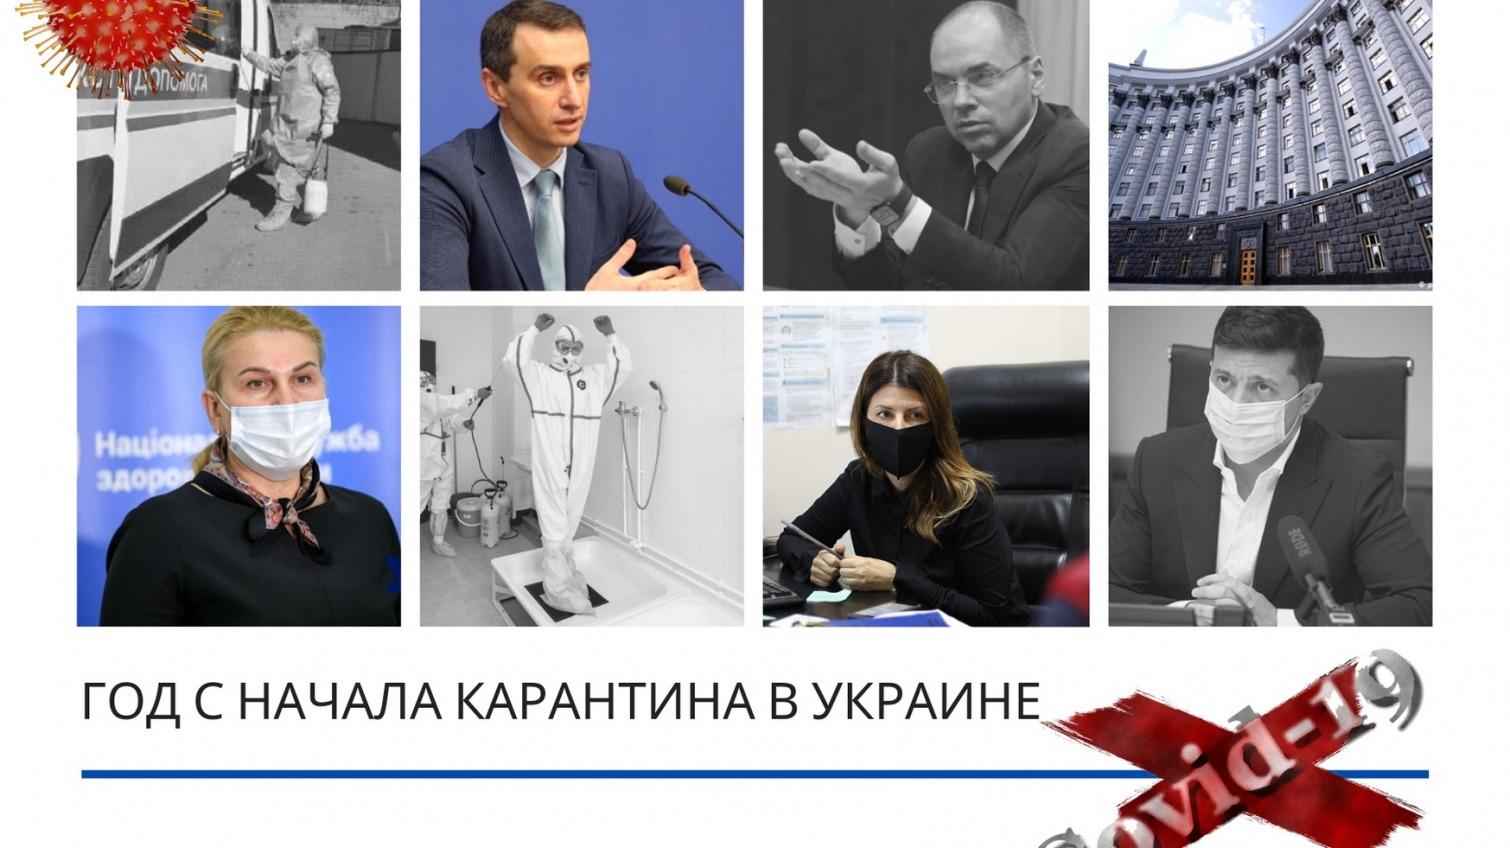 Год карантина: как пандемия коронавируса изменила Одессу «фото»